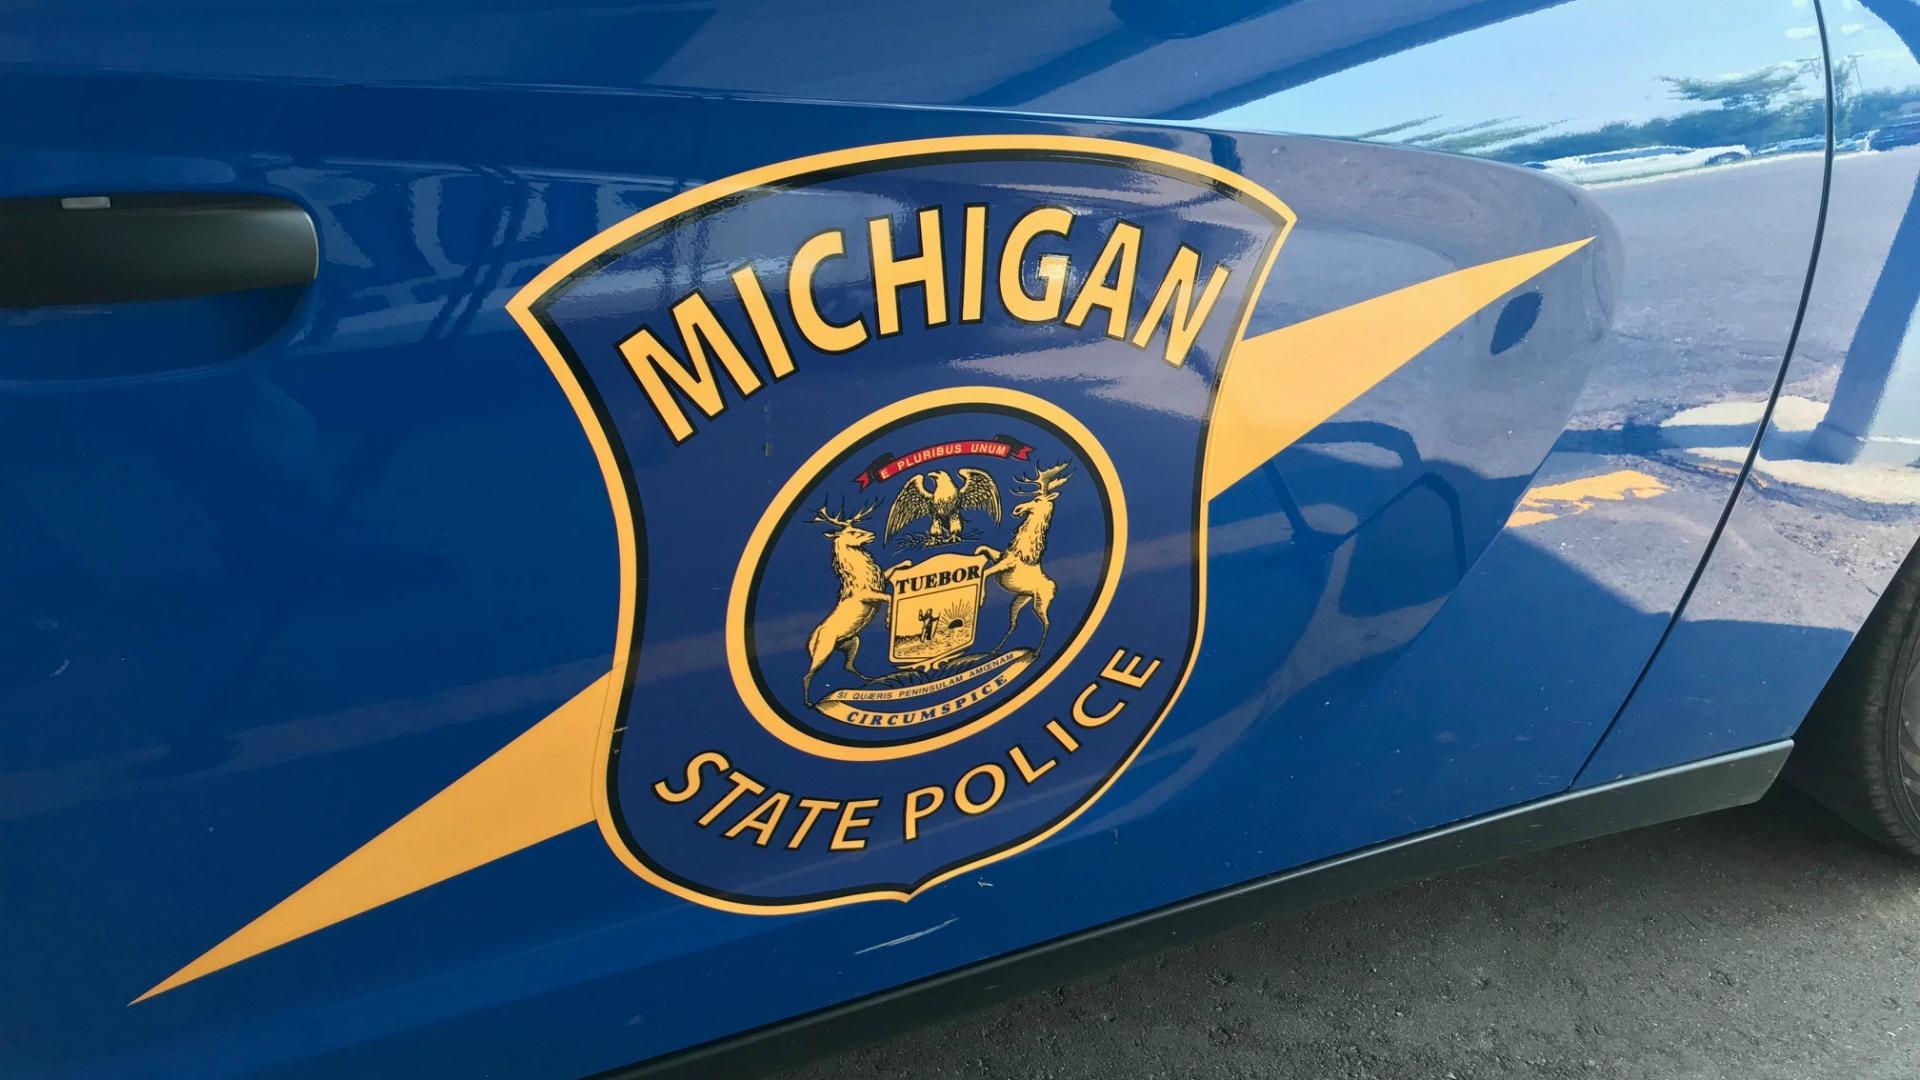 generic michigan state police_1534205993332.jpg